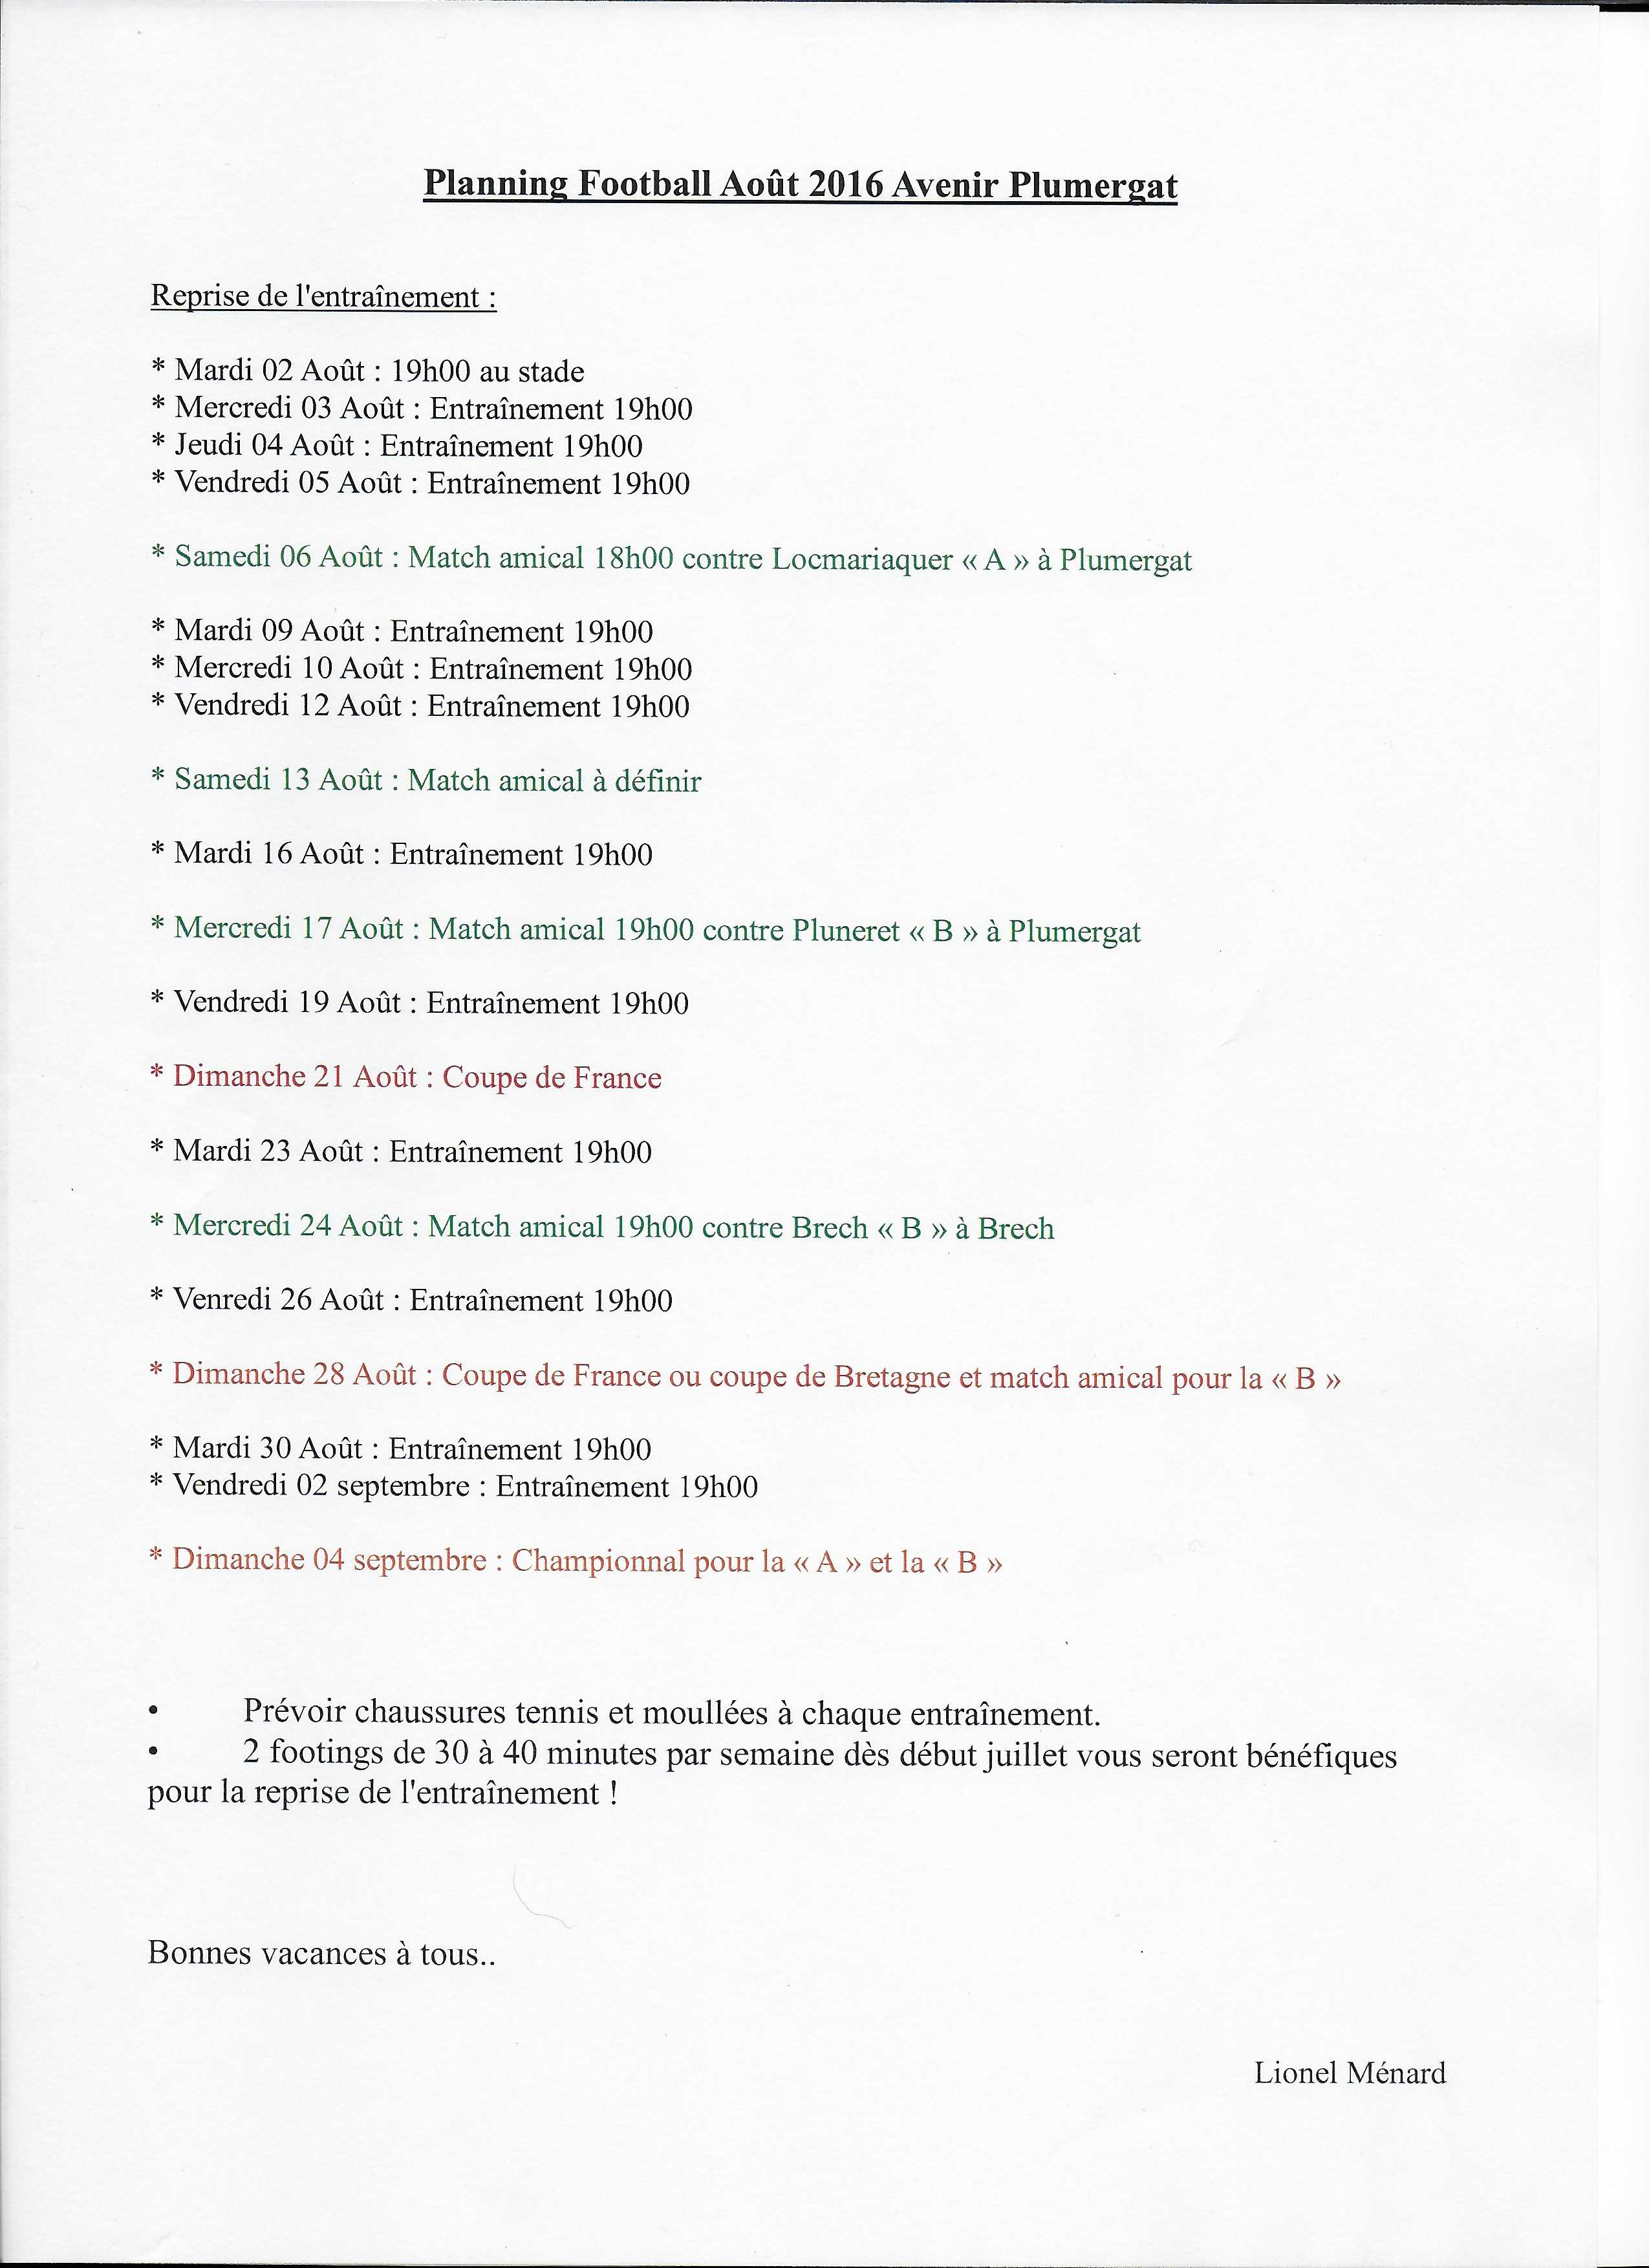 planning saison 2016/2017